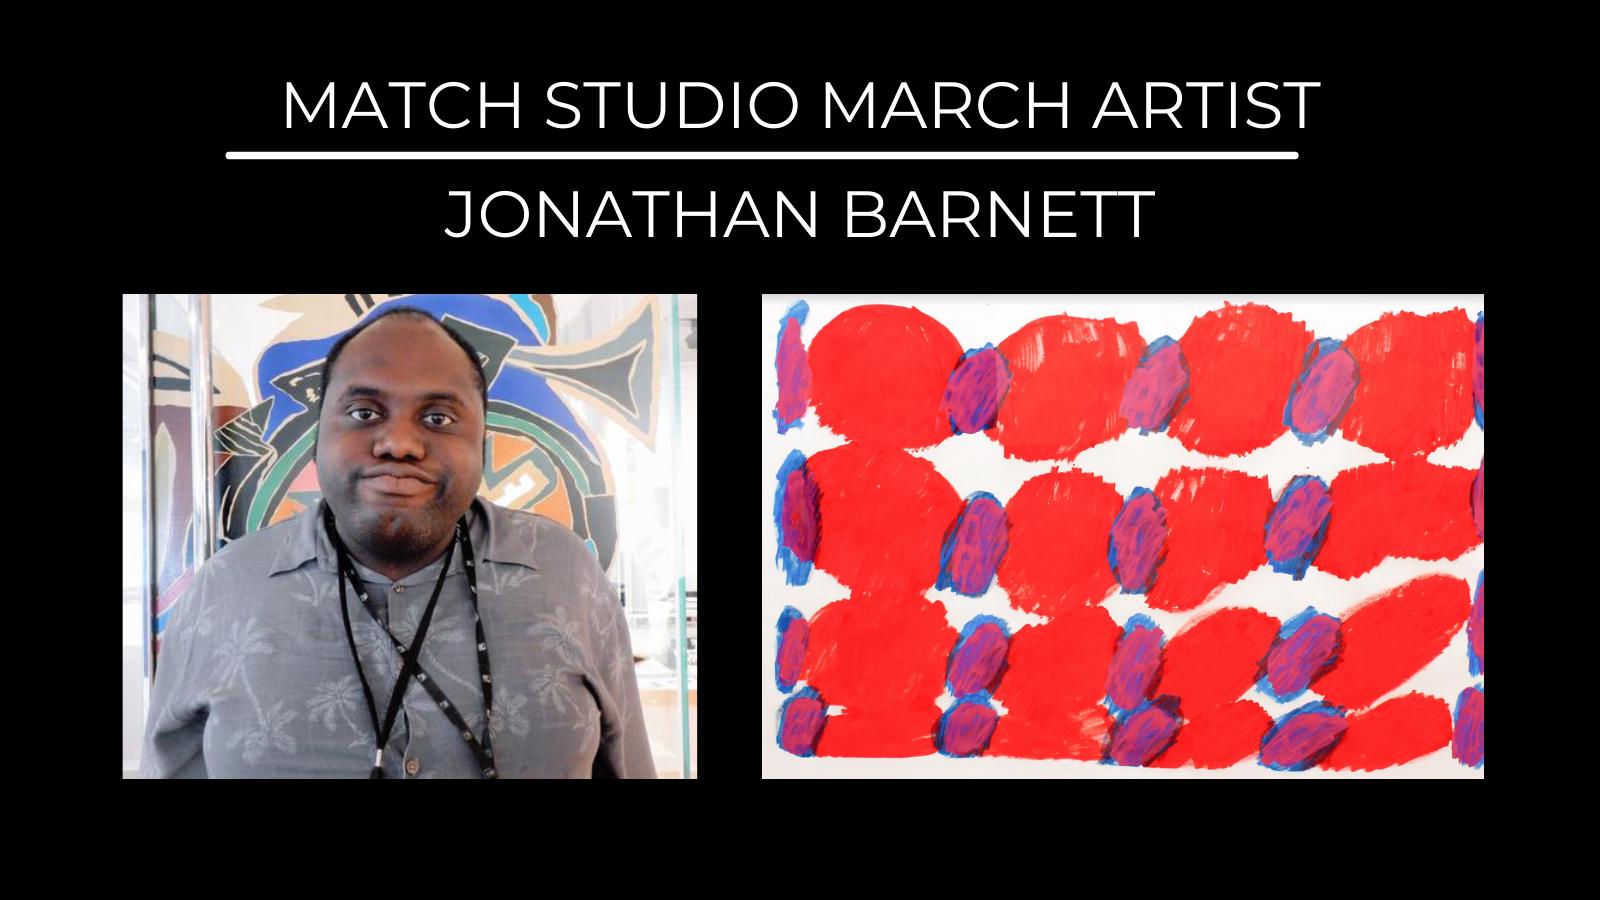 Twitter_Match Studio March Artist